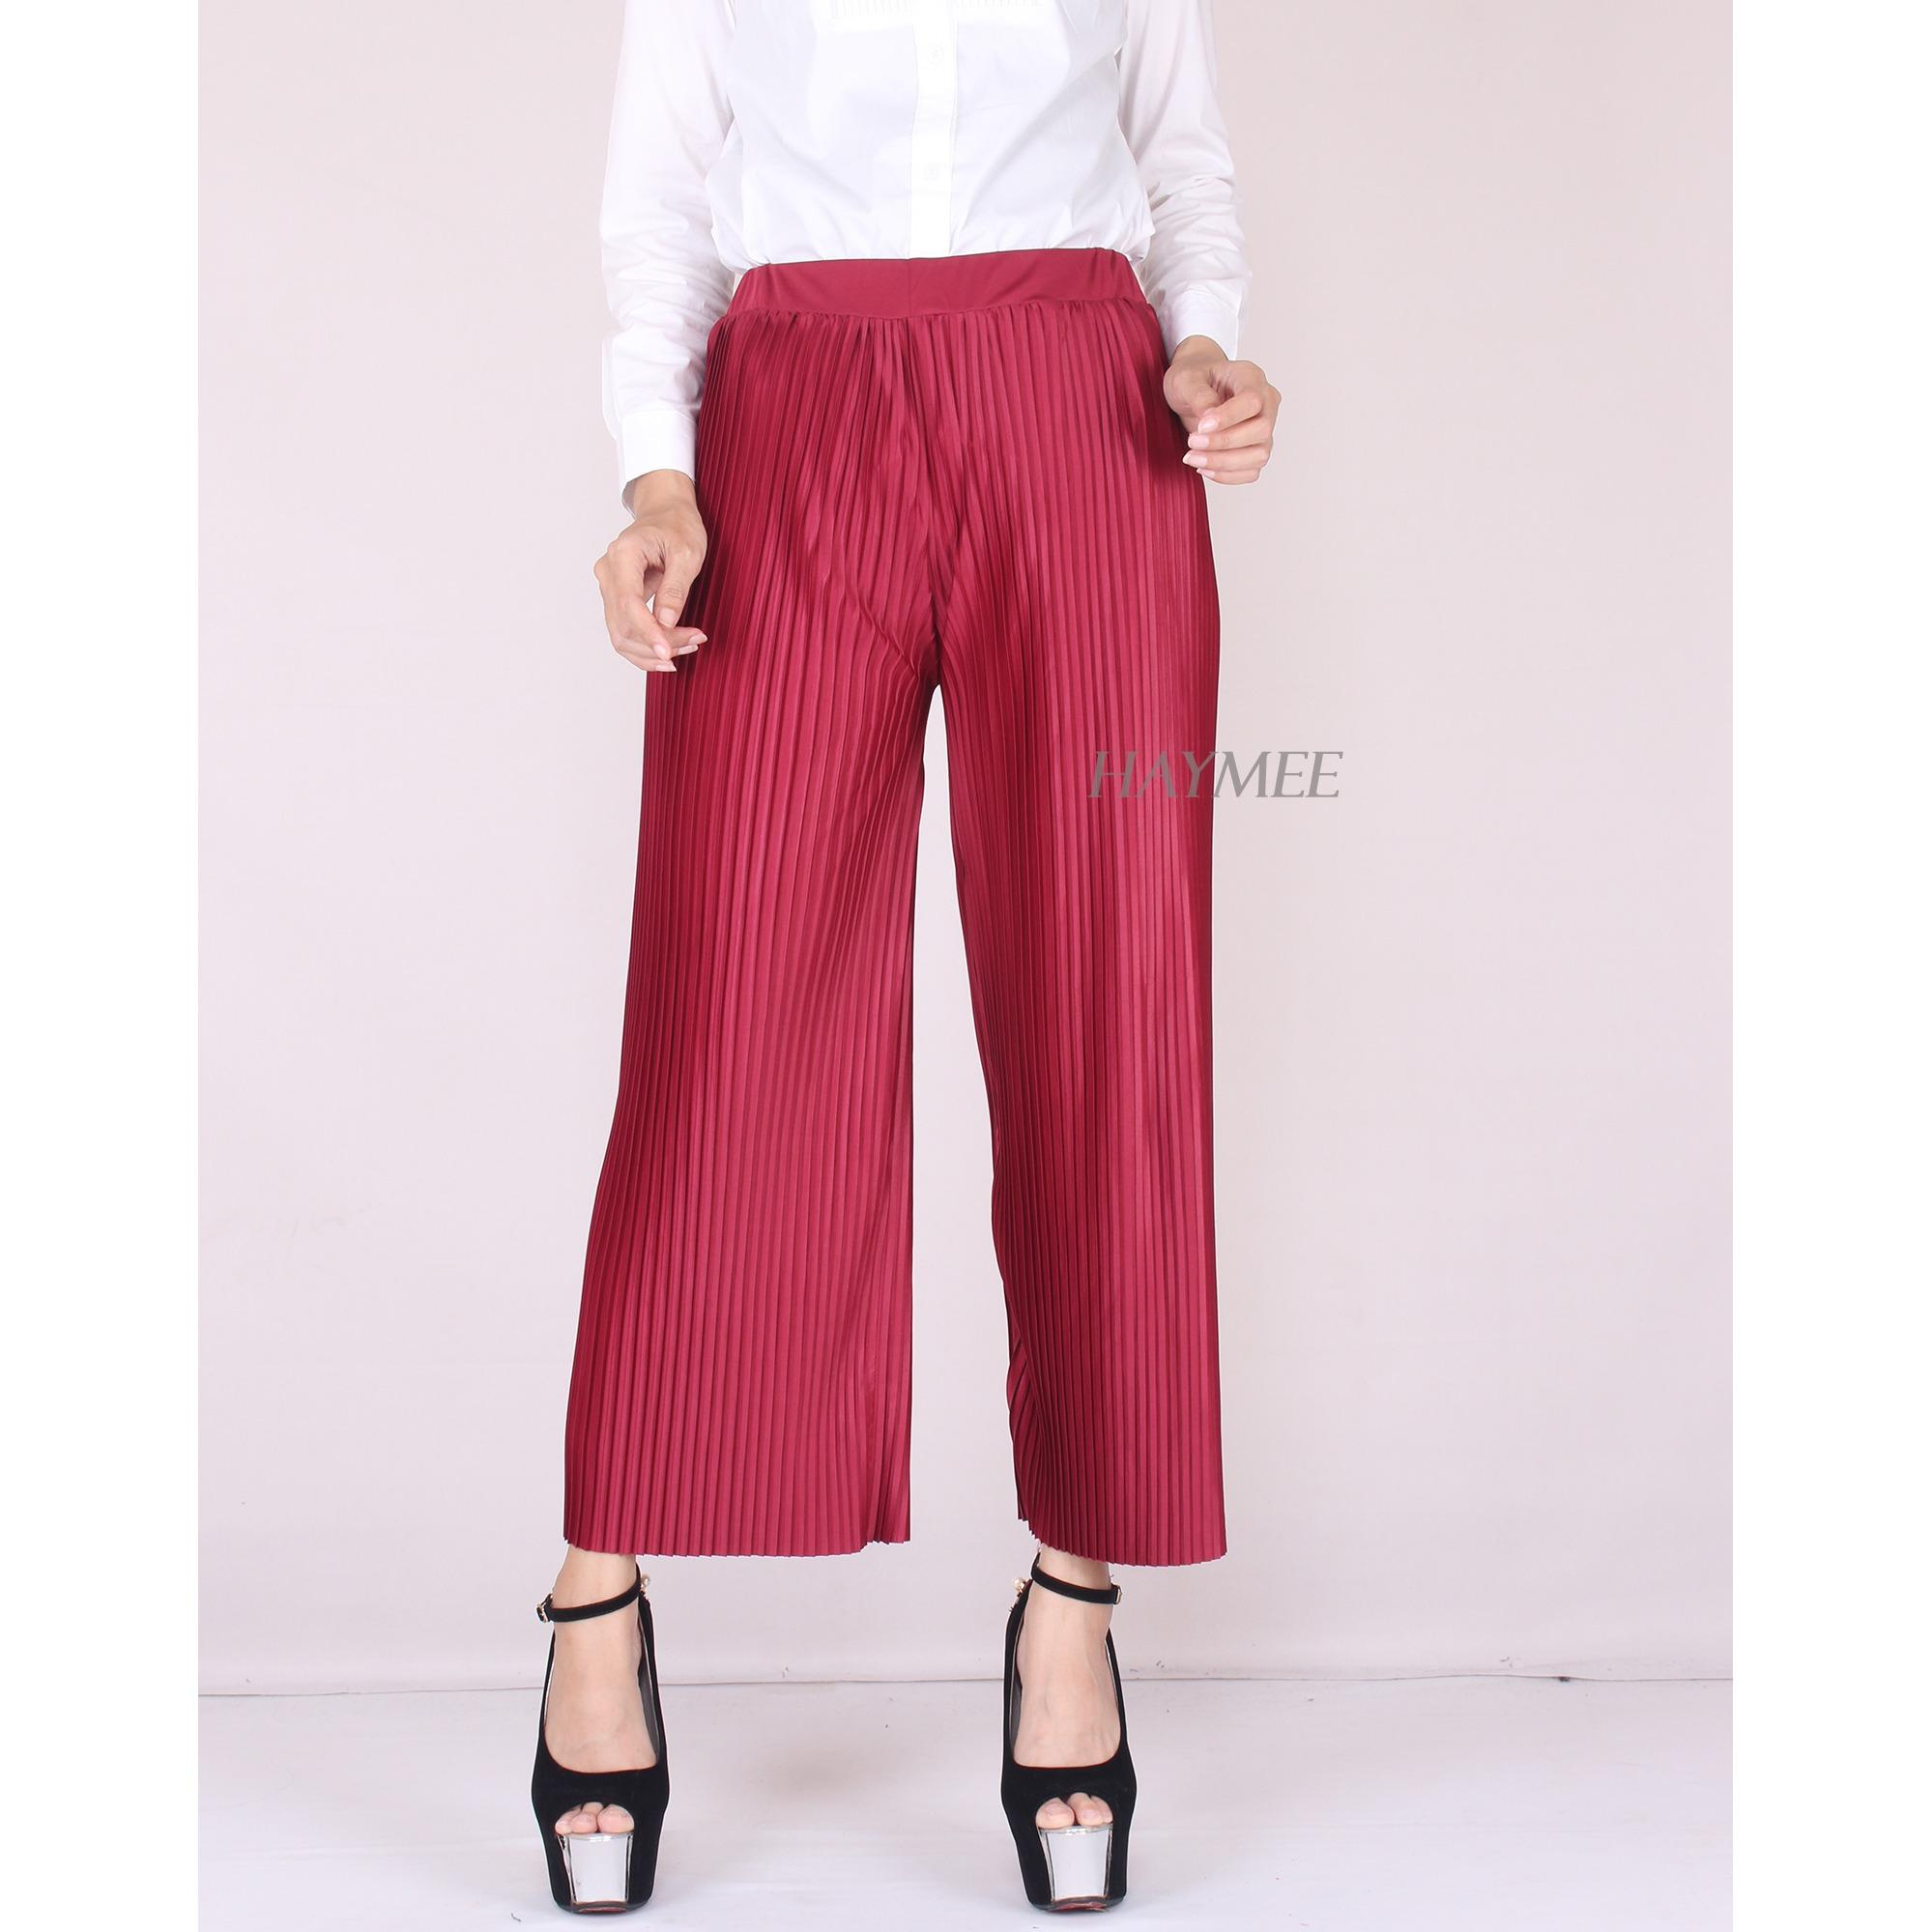 Spesifikasi Haymeestore Celana Plisket Kulot Wanita Celana Pleats Cullot Cewek Kantor Casual Fashion Terbaru